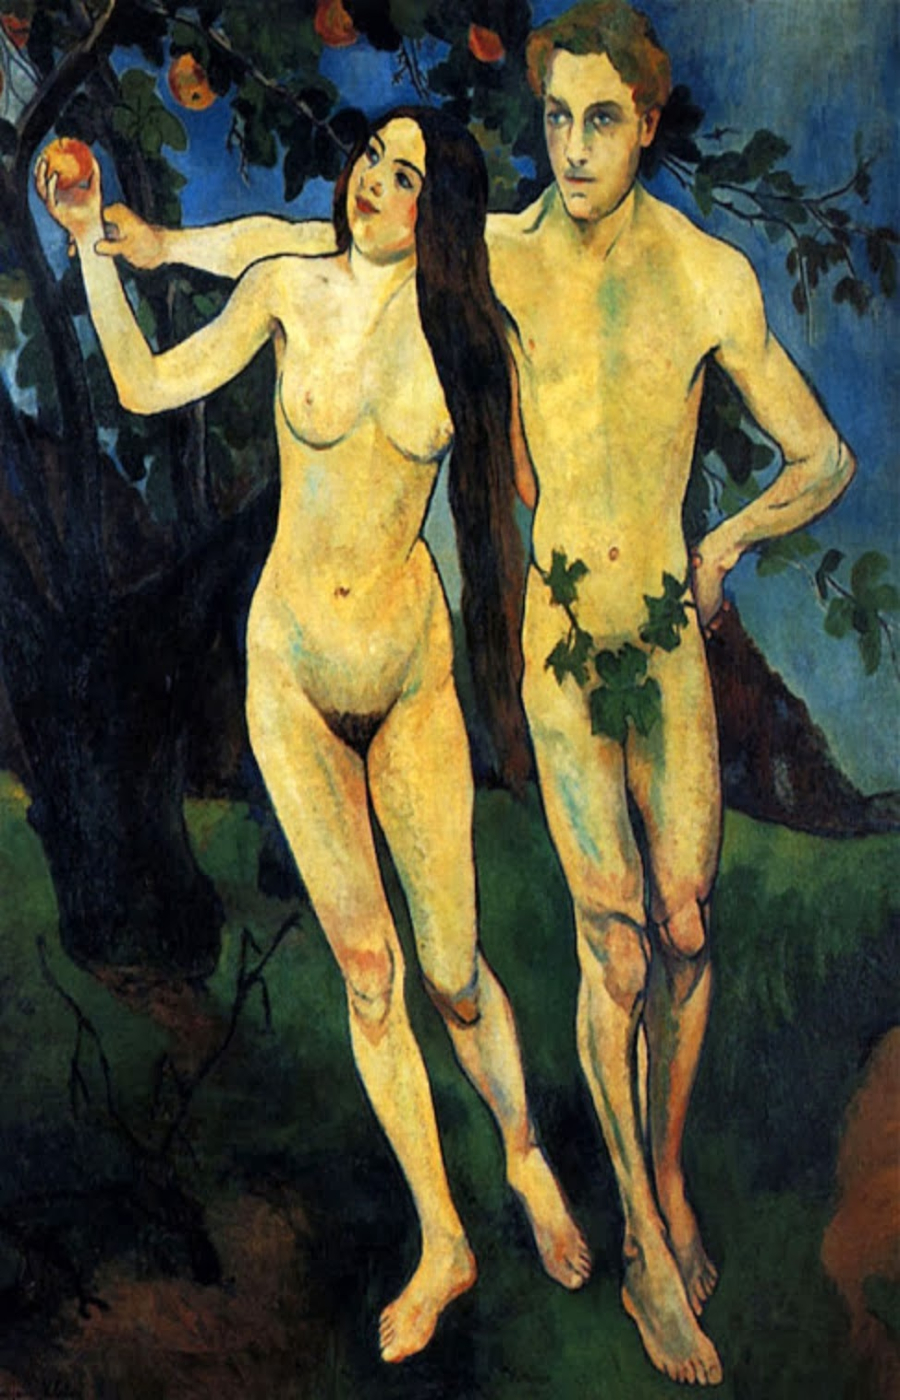 Suzanne Valadon. Adam et Eve, 1909. Centro George Pompidou